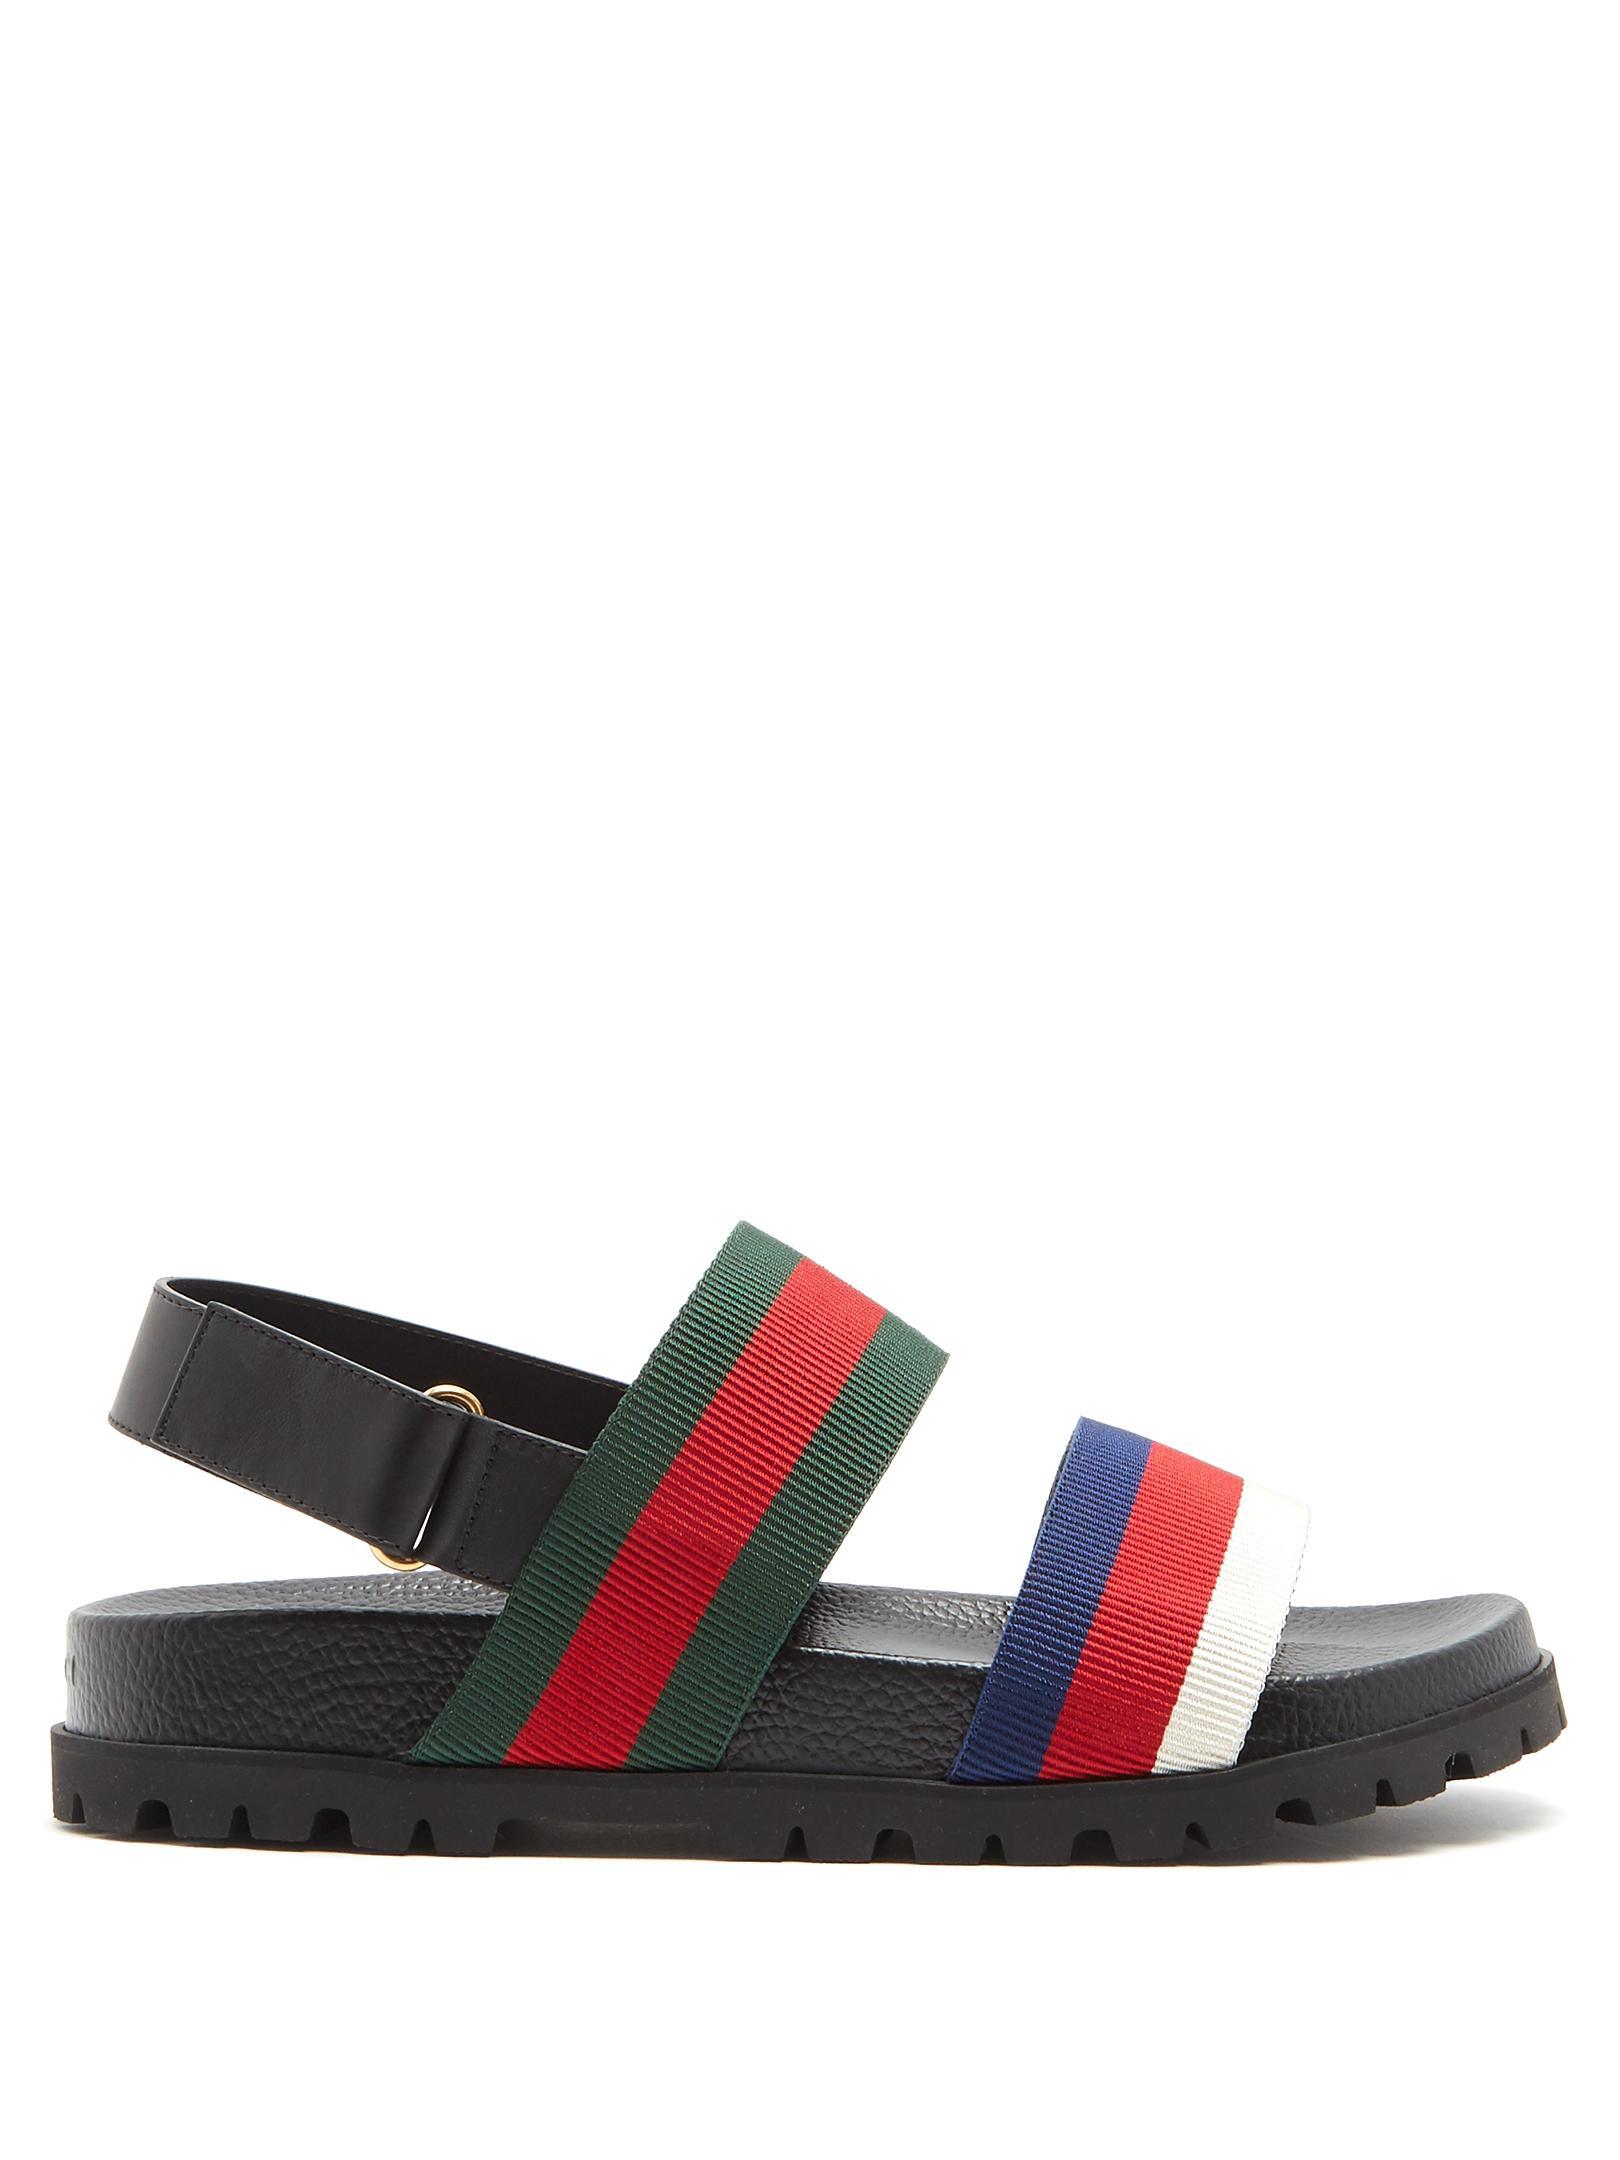 6523667c4b57 Lyst - Gucci Rimini Striped Sandal in Black for Men